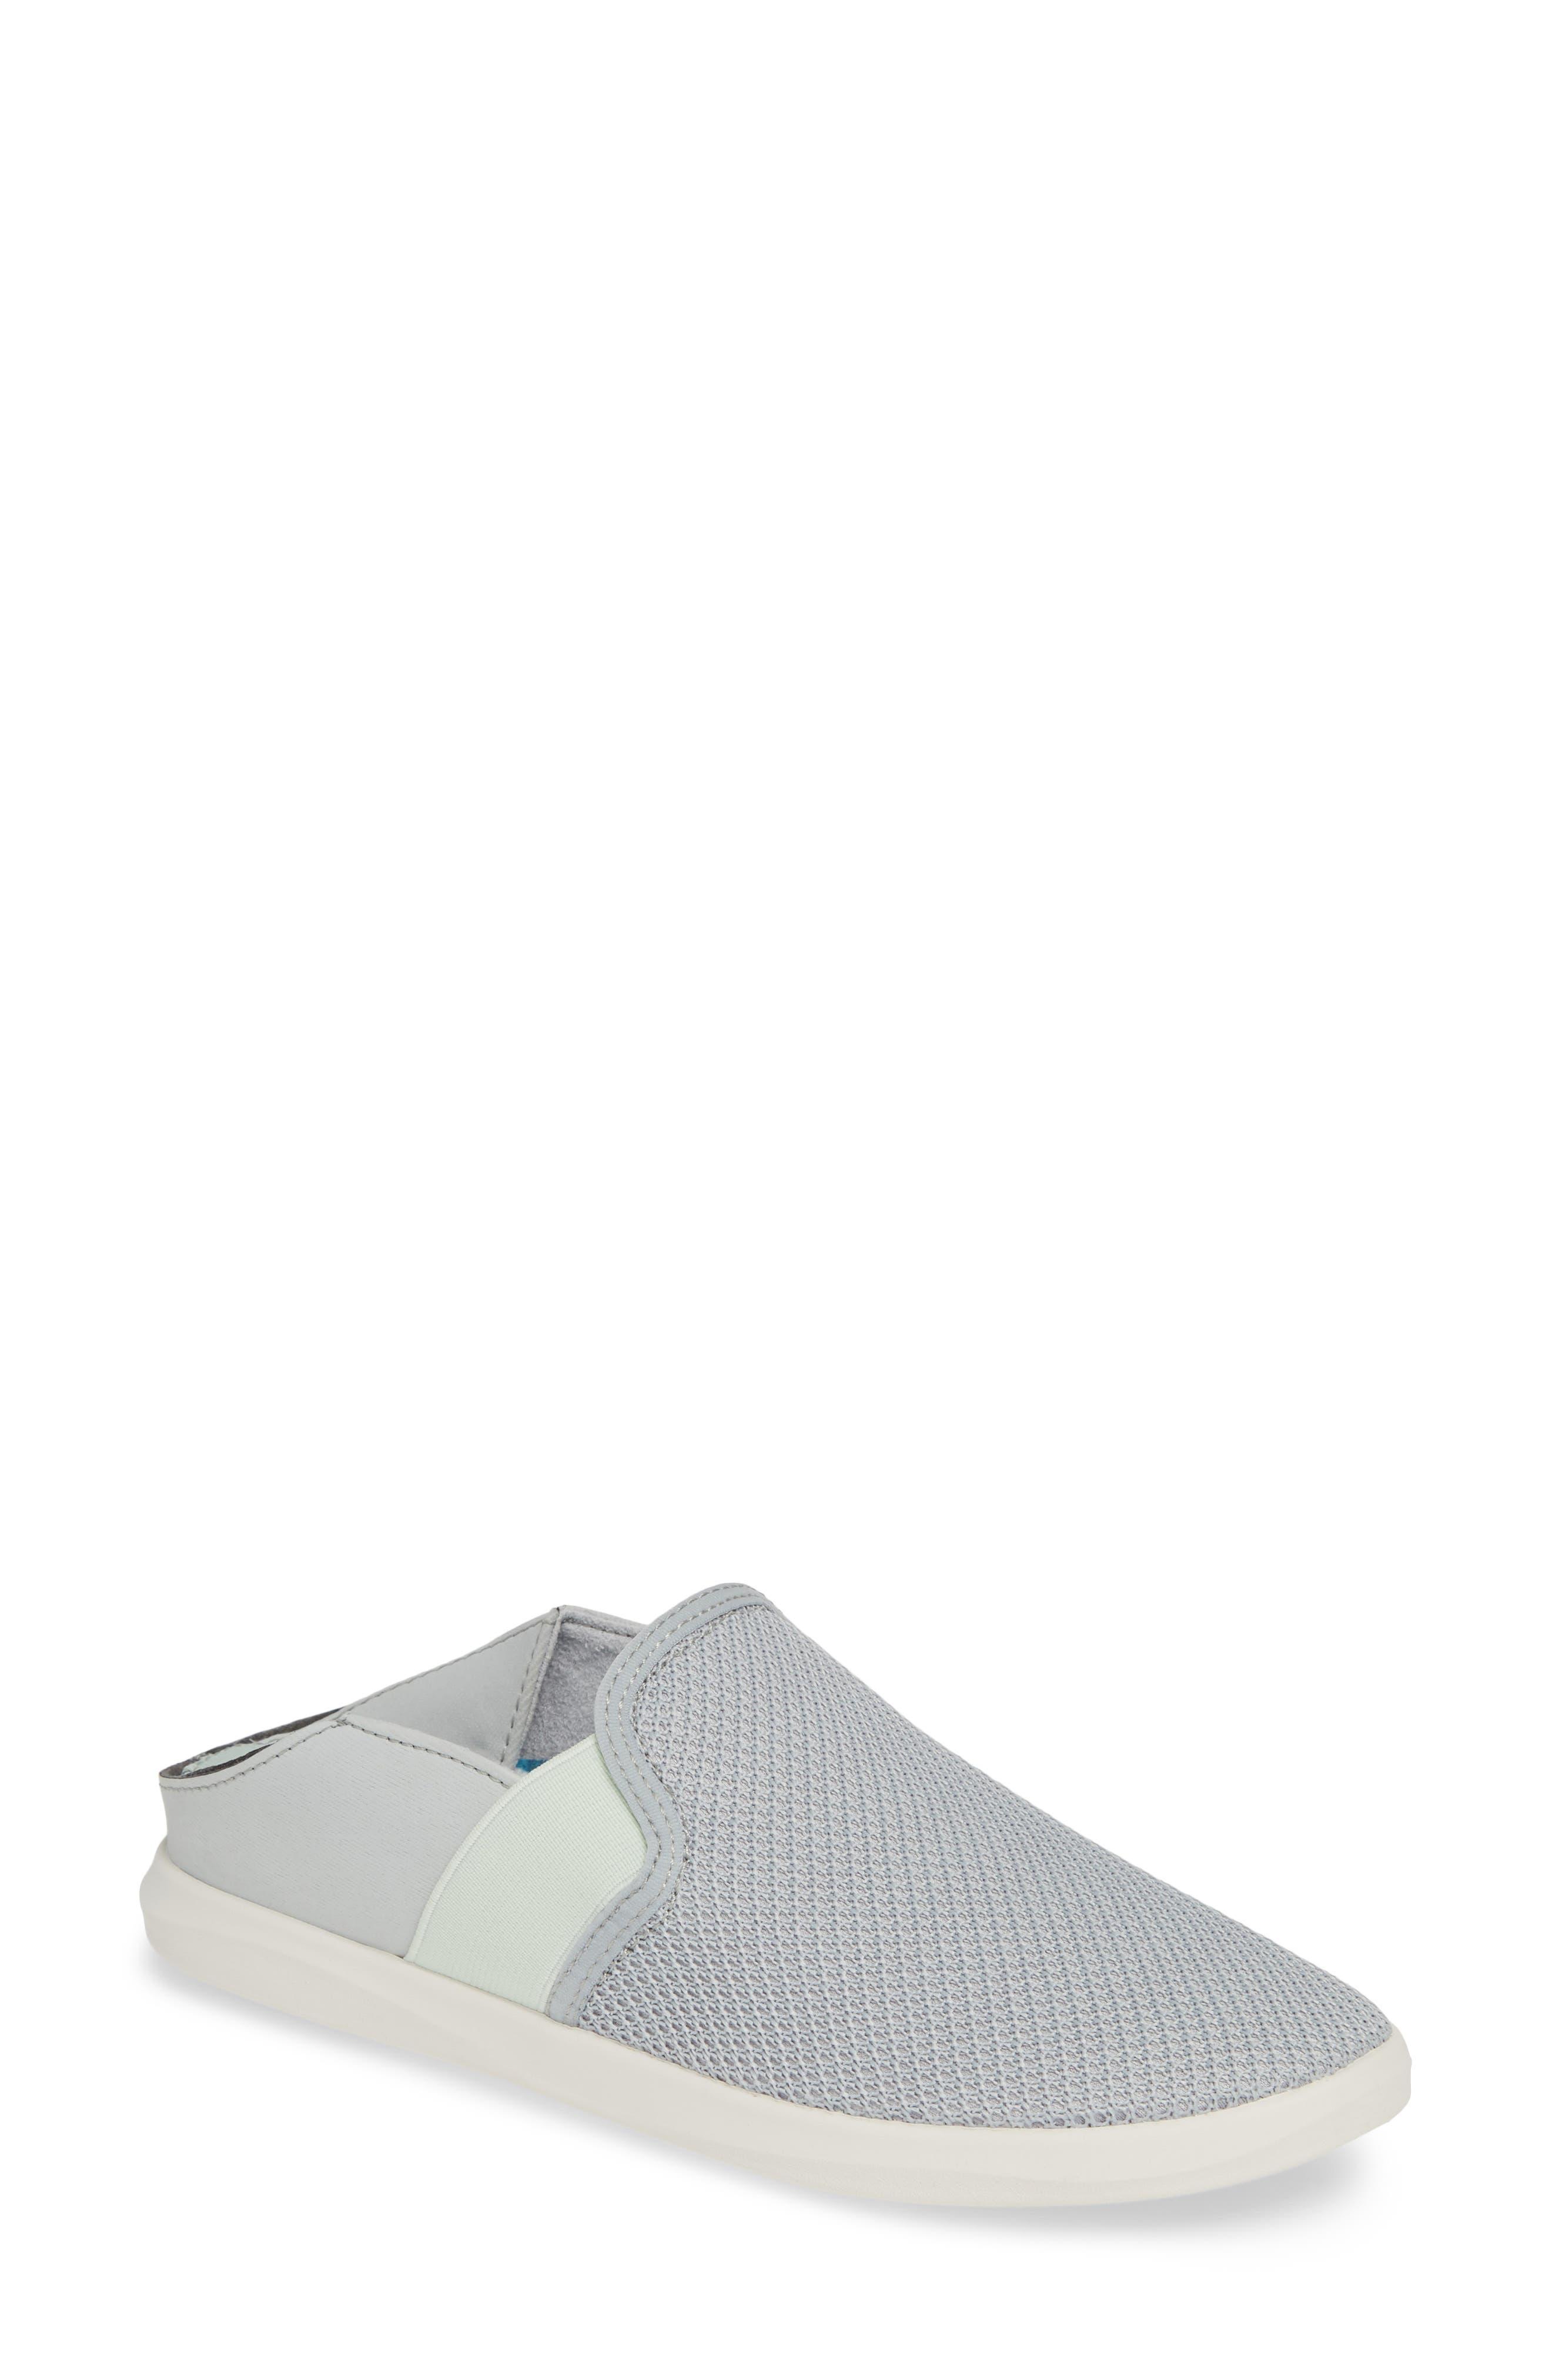 Olukai Haleiwa Pai Sneaker- Grey